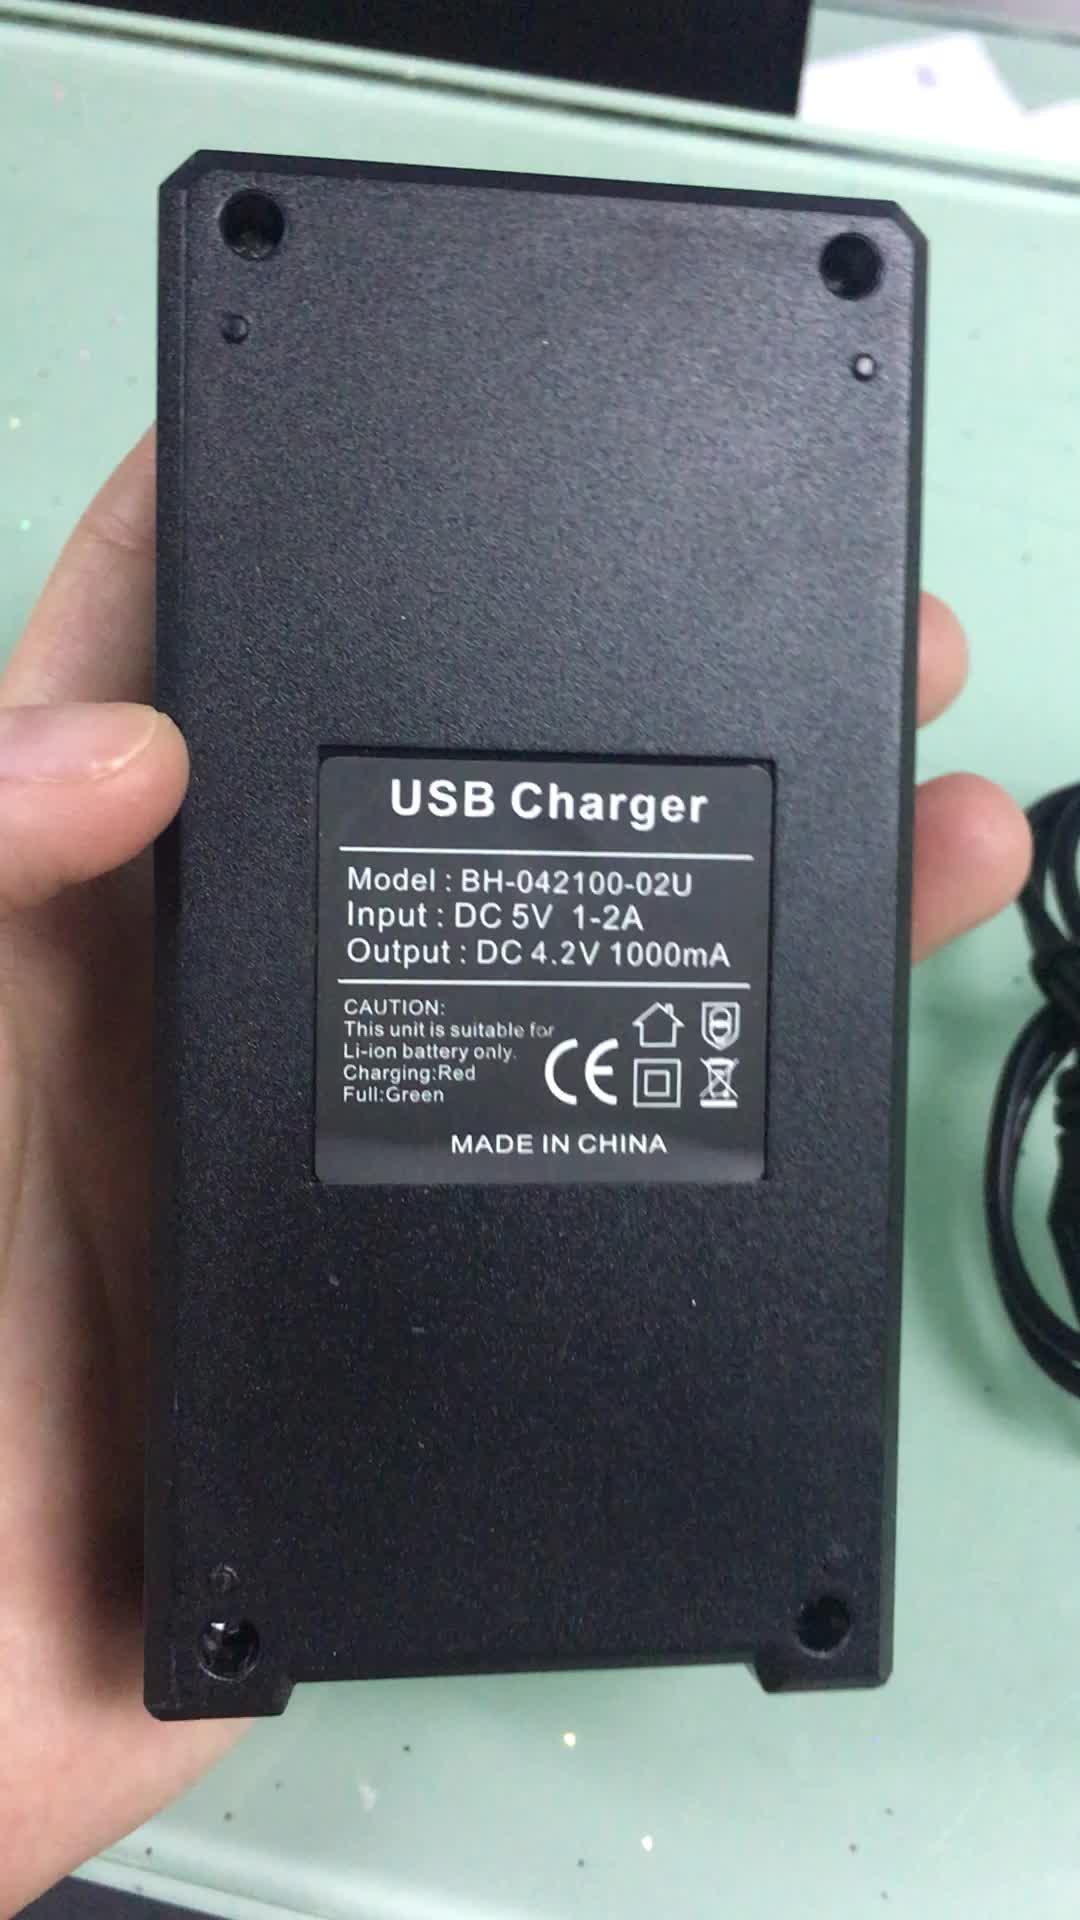 USB อัจฉริยะ 2 ช่องสำหรับ Li-Ion แบตเตอรี่ 18650 16340 ชาร์จ